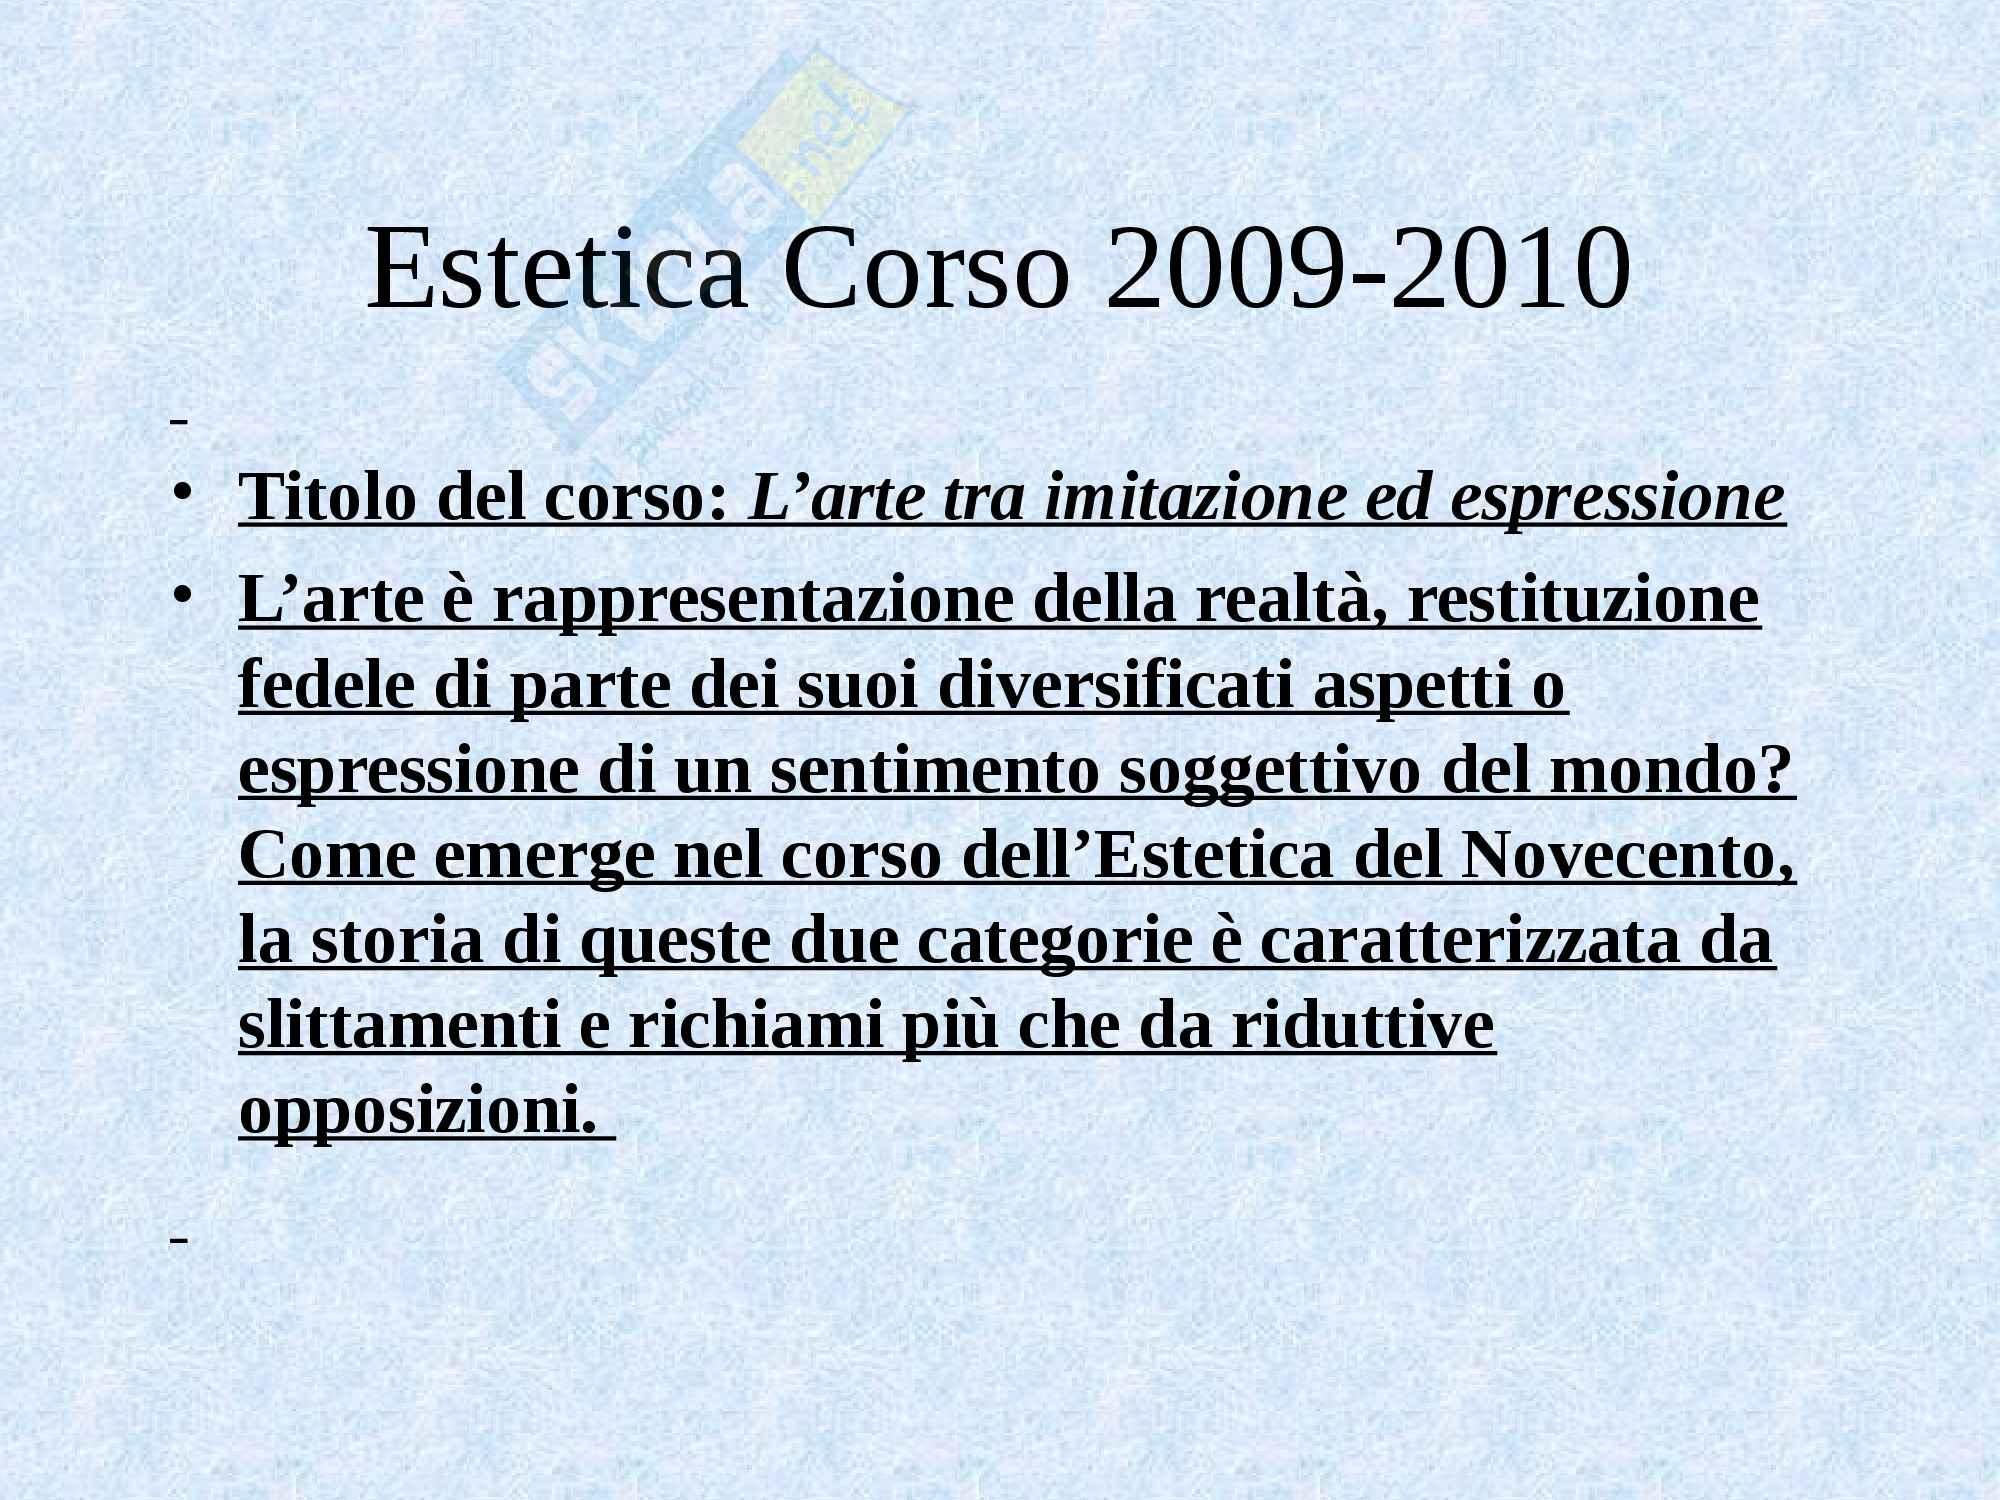 Estetica - lo studio dell'estetica Pag. 21